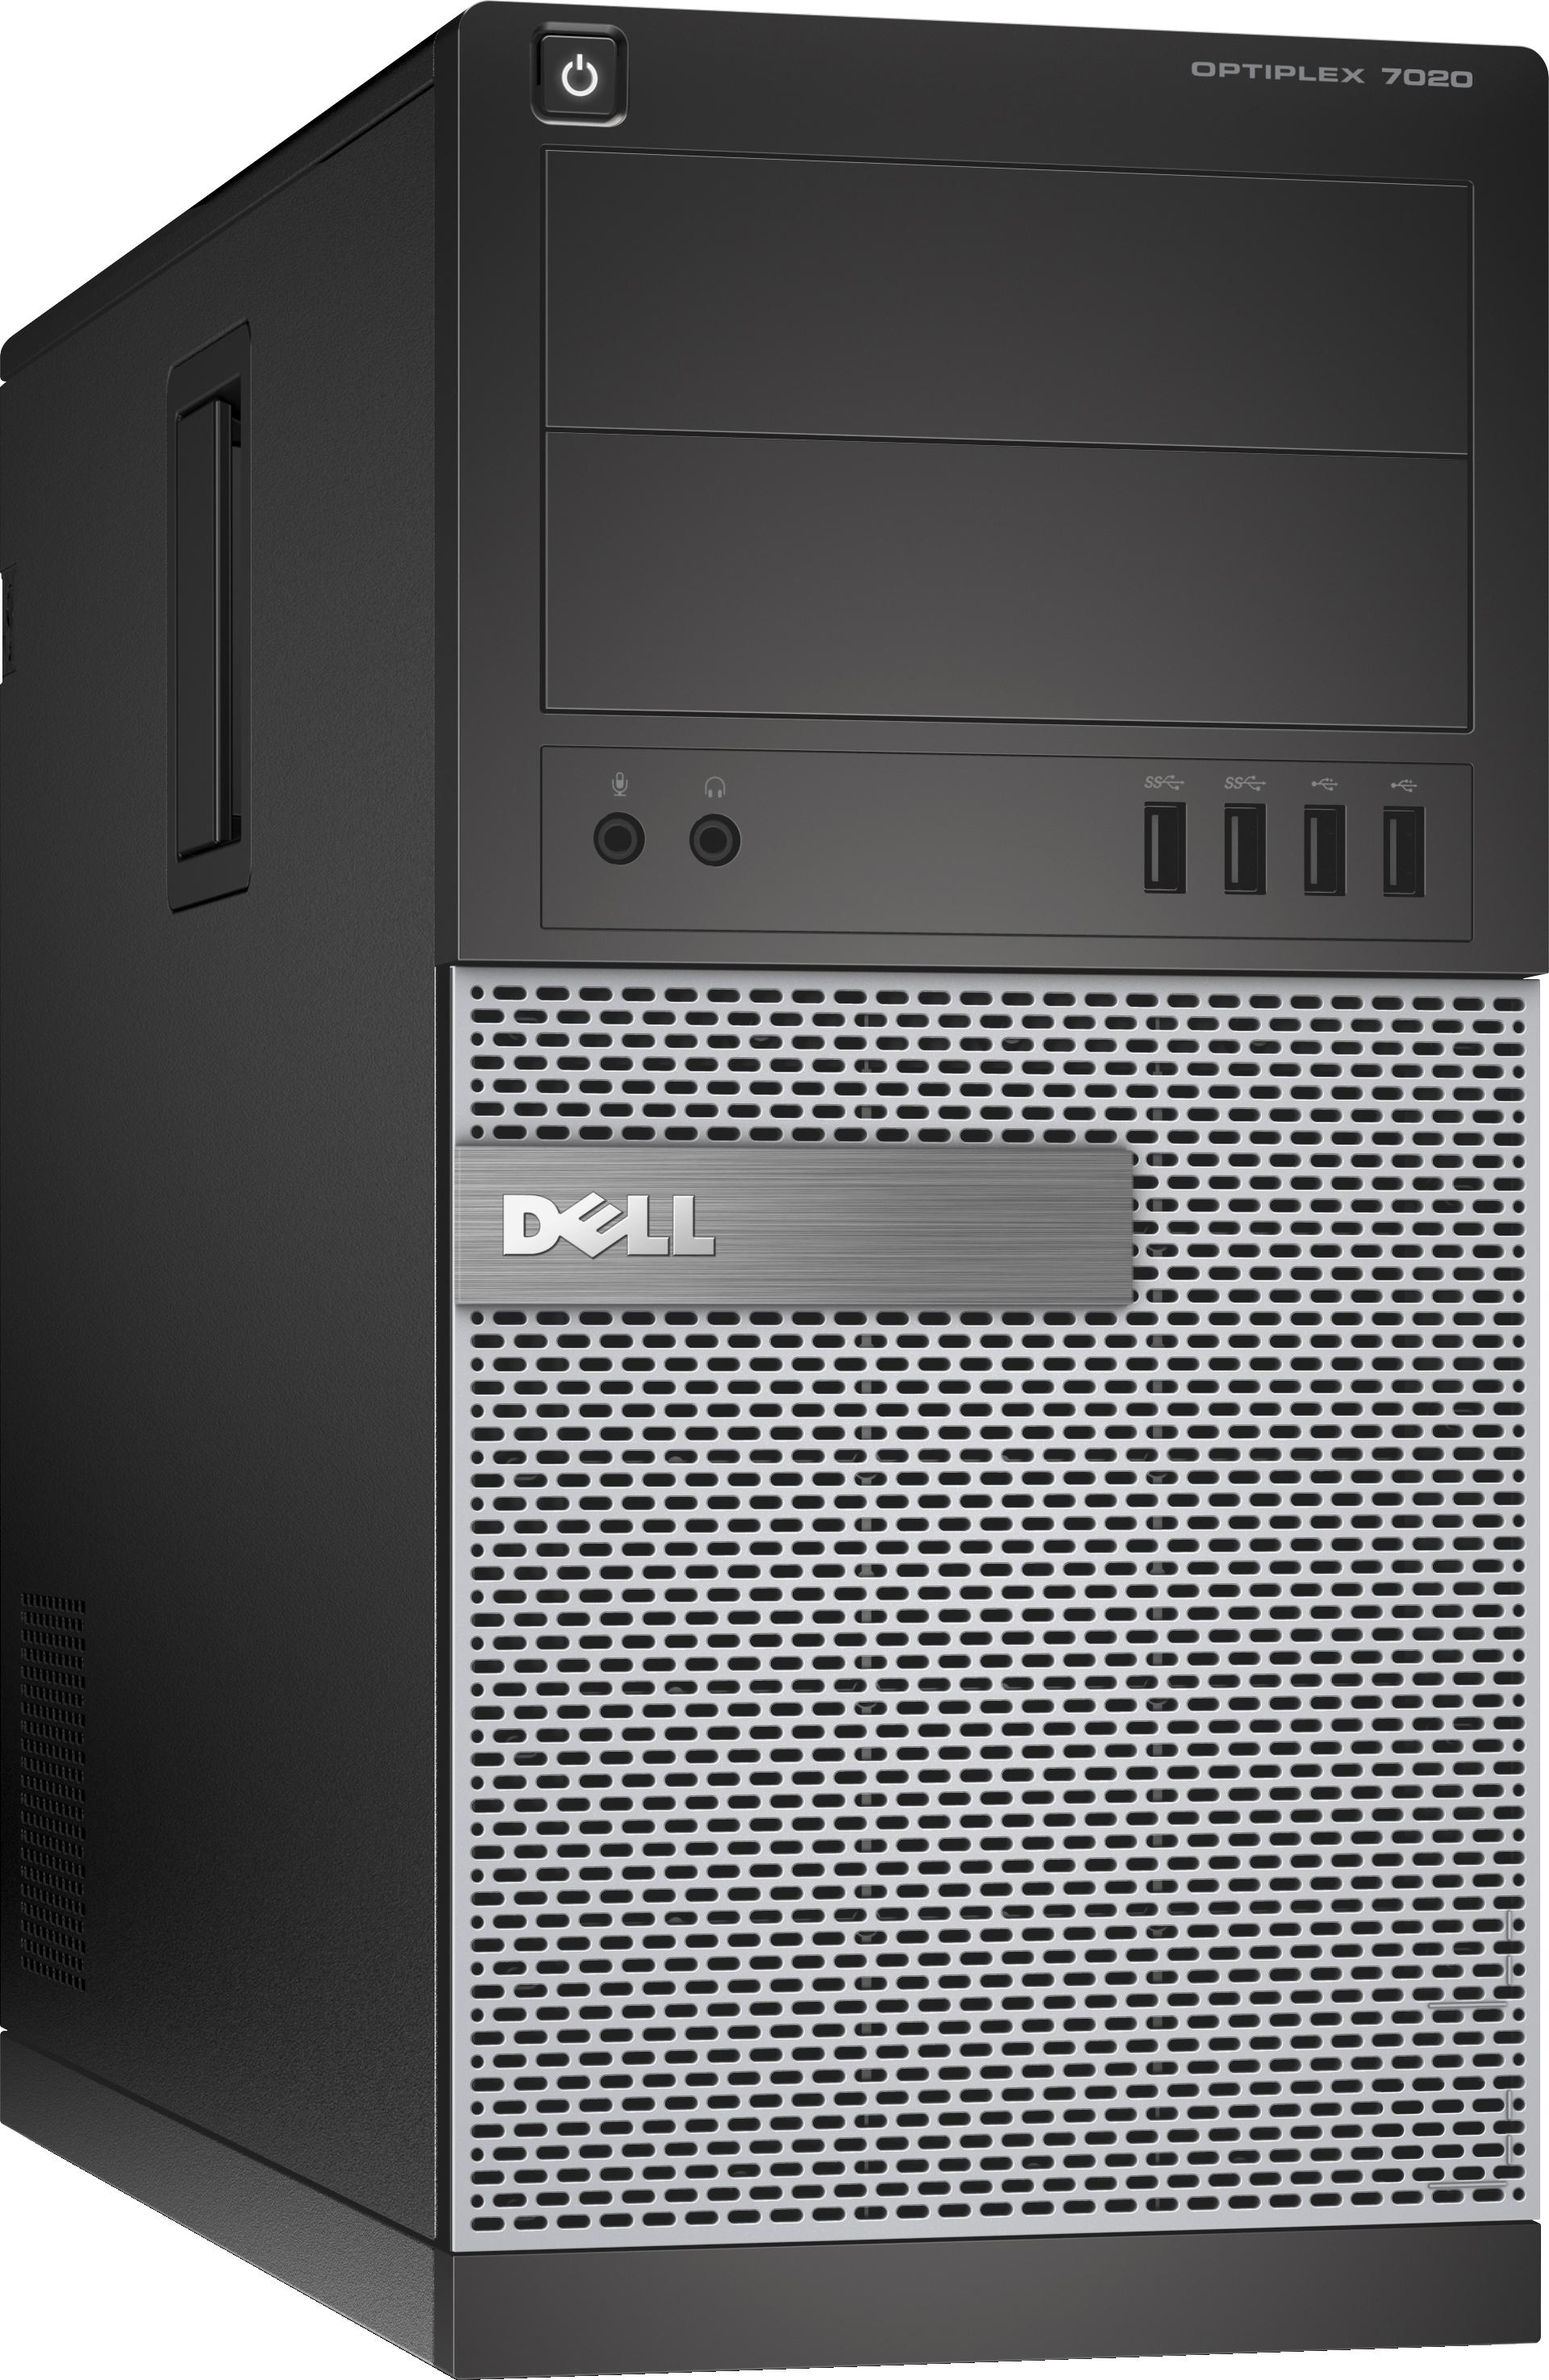 Dell optiplex 760 xp Drivers